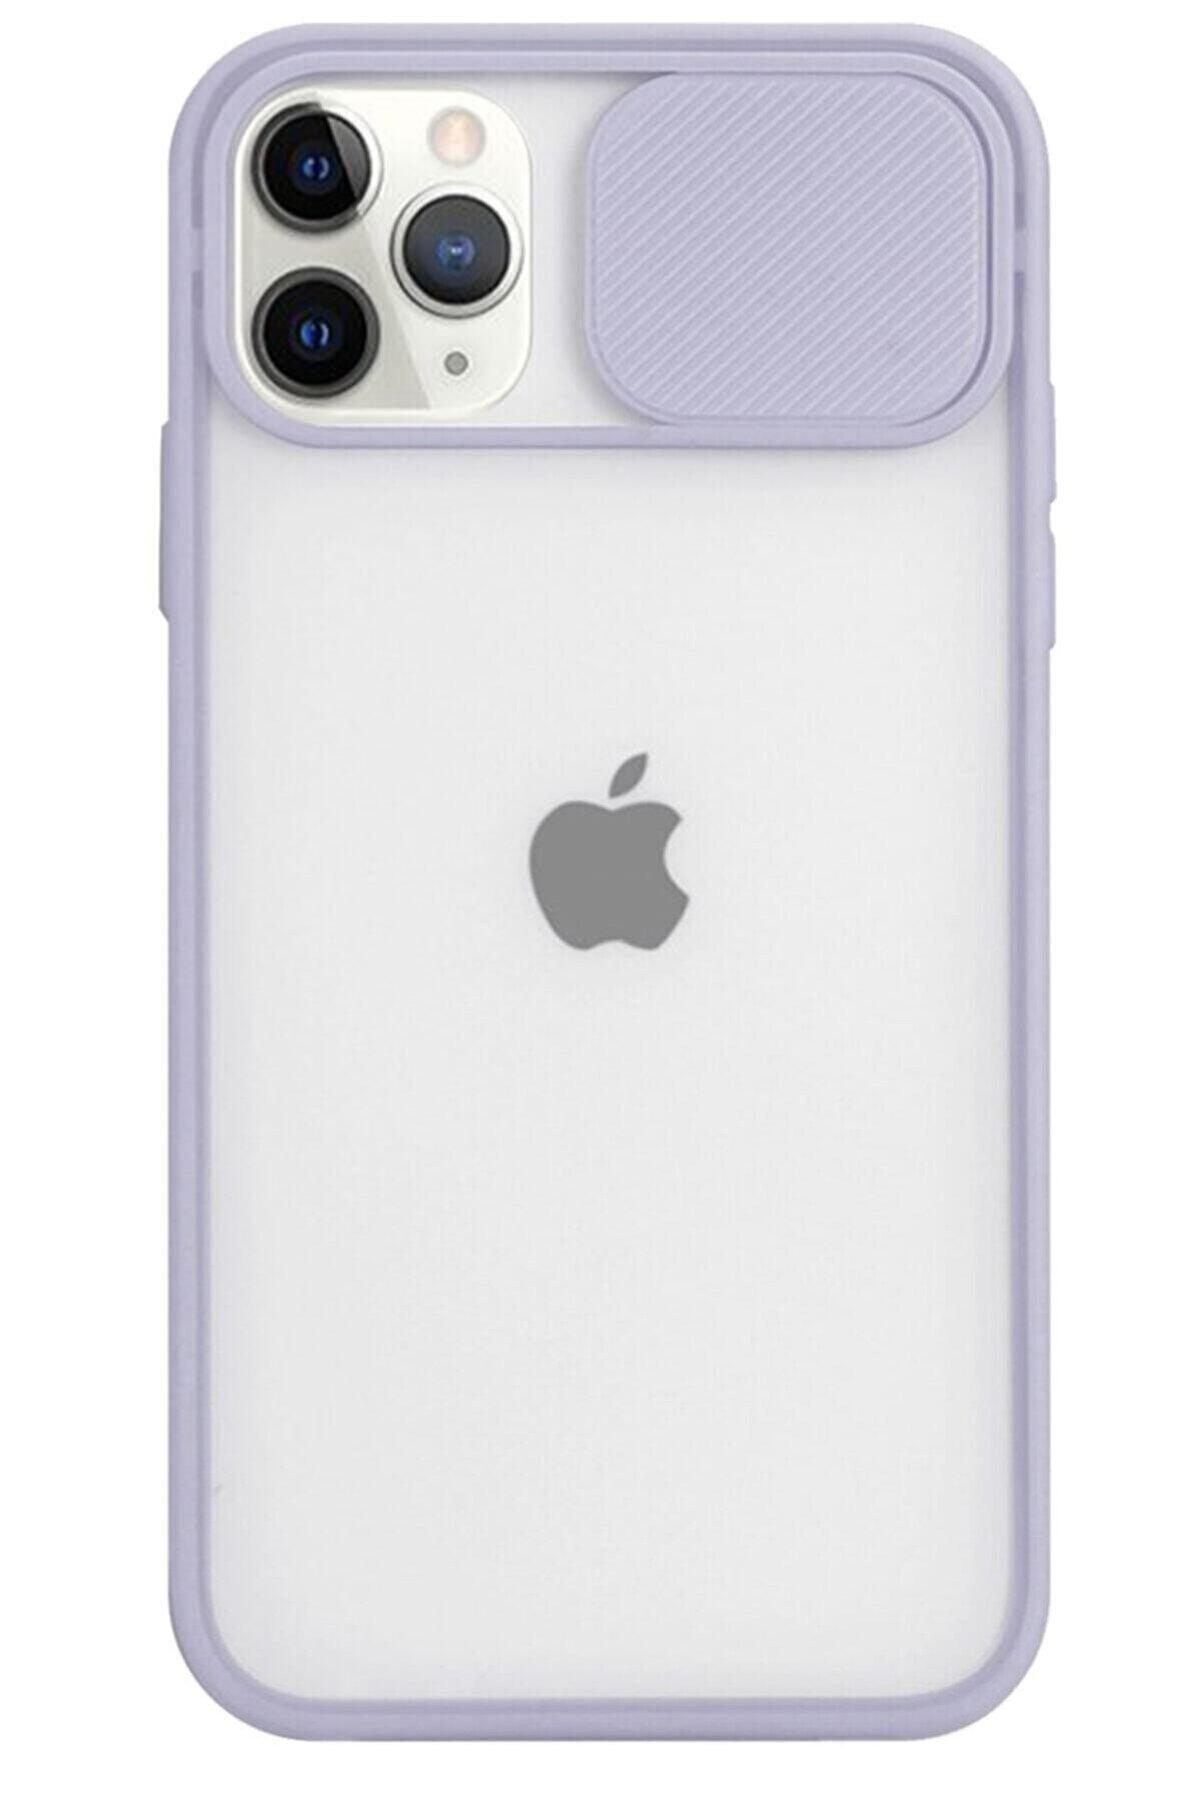 Telehome Iphone 12 Pro Max Kamera Korumalı Slayt Telefon Kılıfı